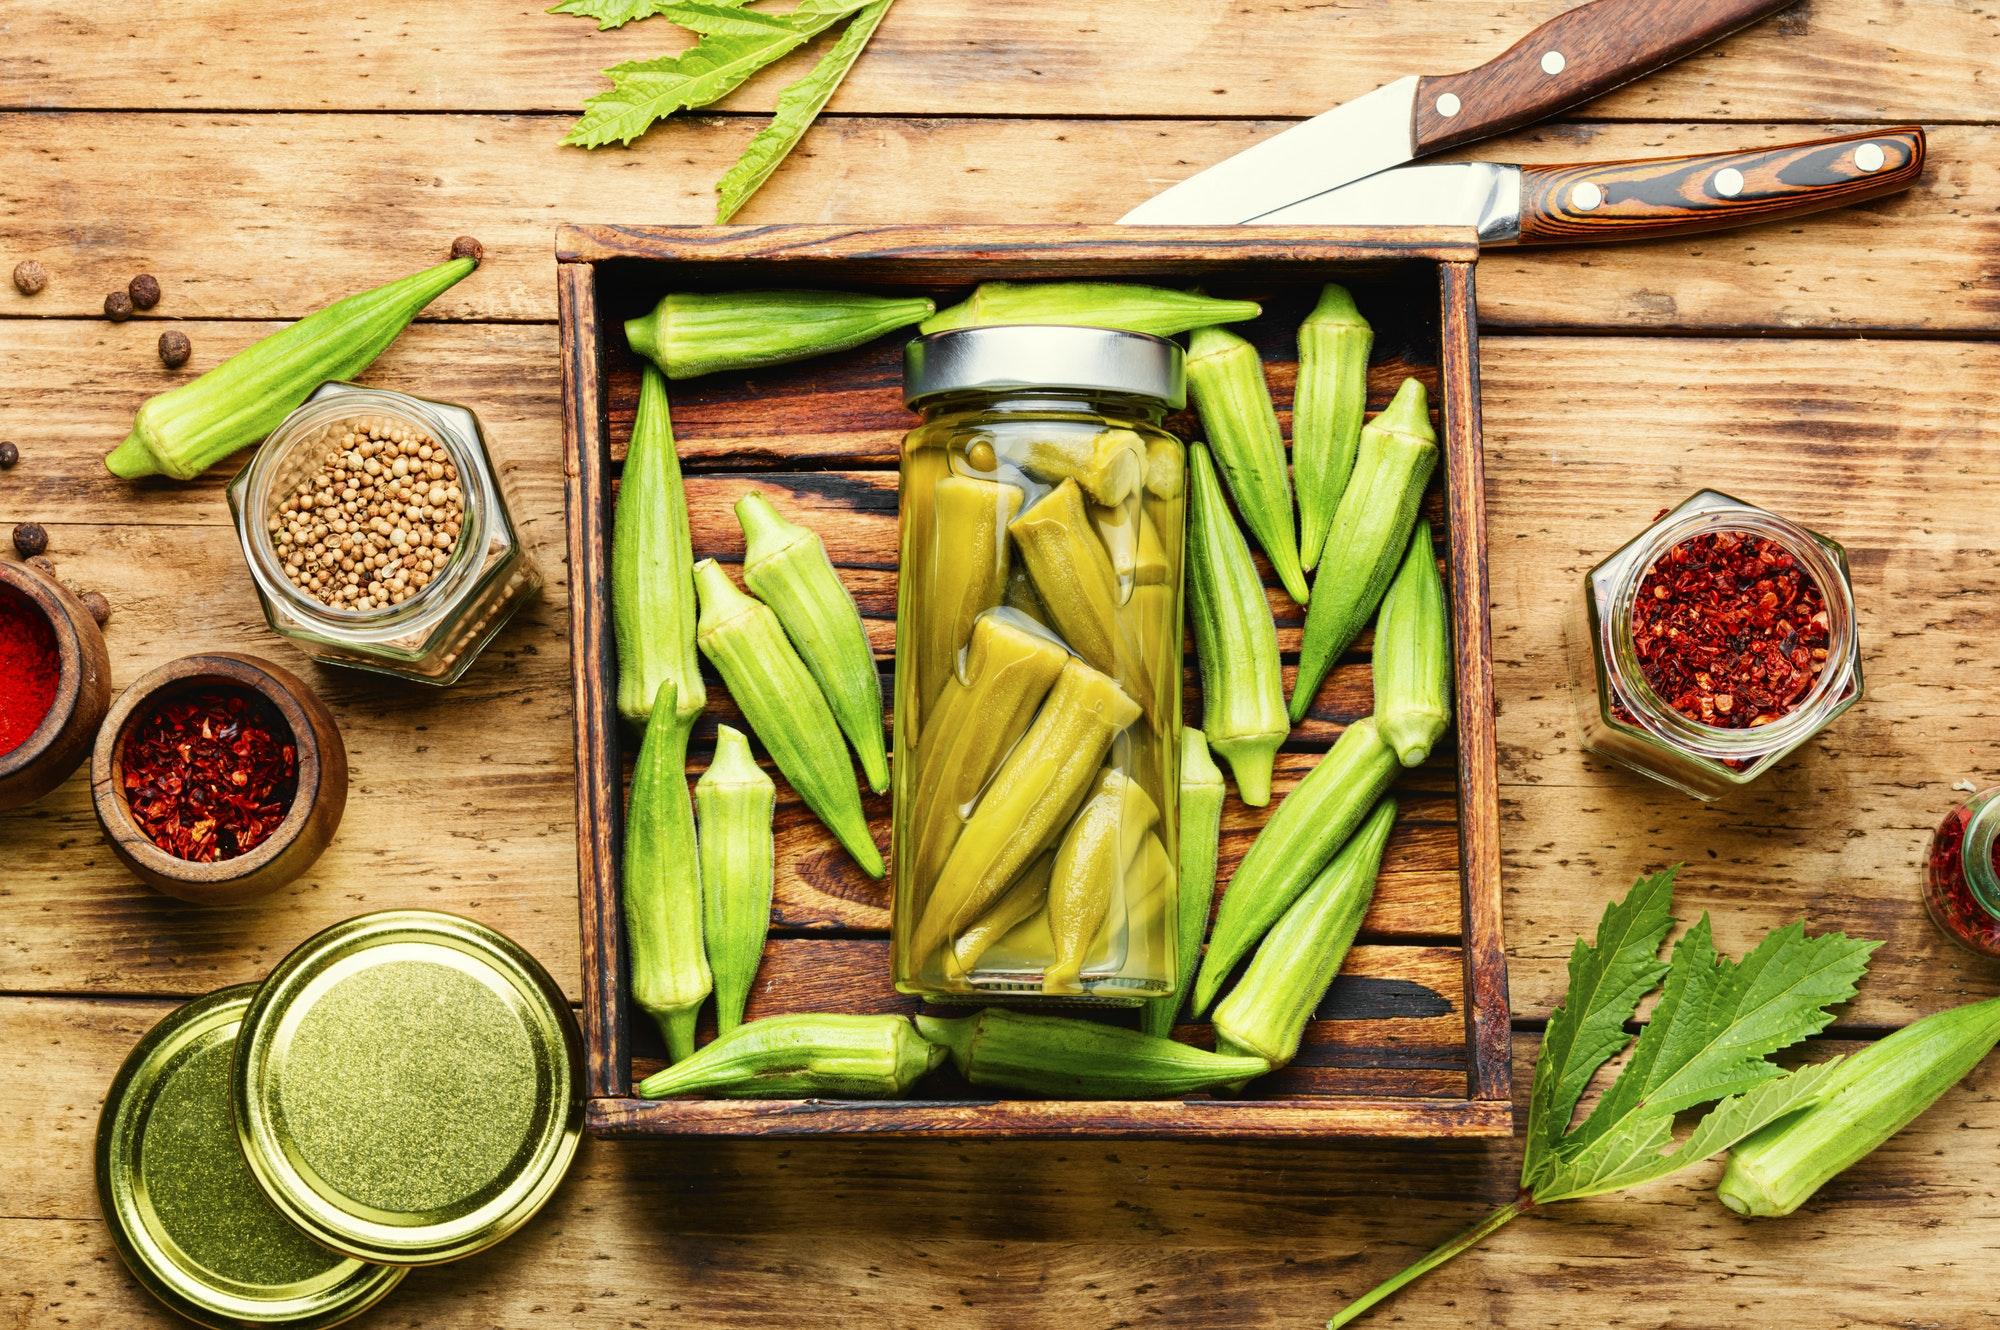 Canned okra in jars